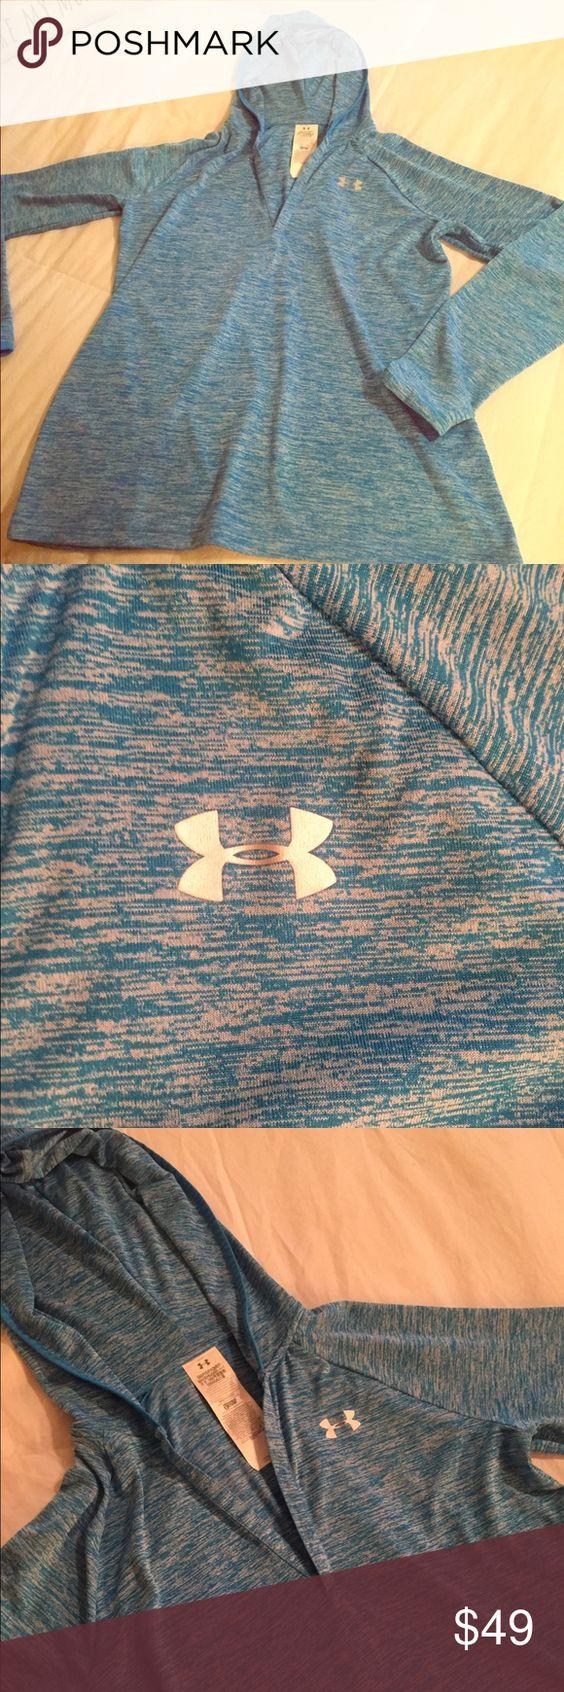 Under Armour Active Wear Hoodie Small Under Armour loose hoodie - only worn once! Under Armour Tops Sweatshirts & Hoodies